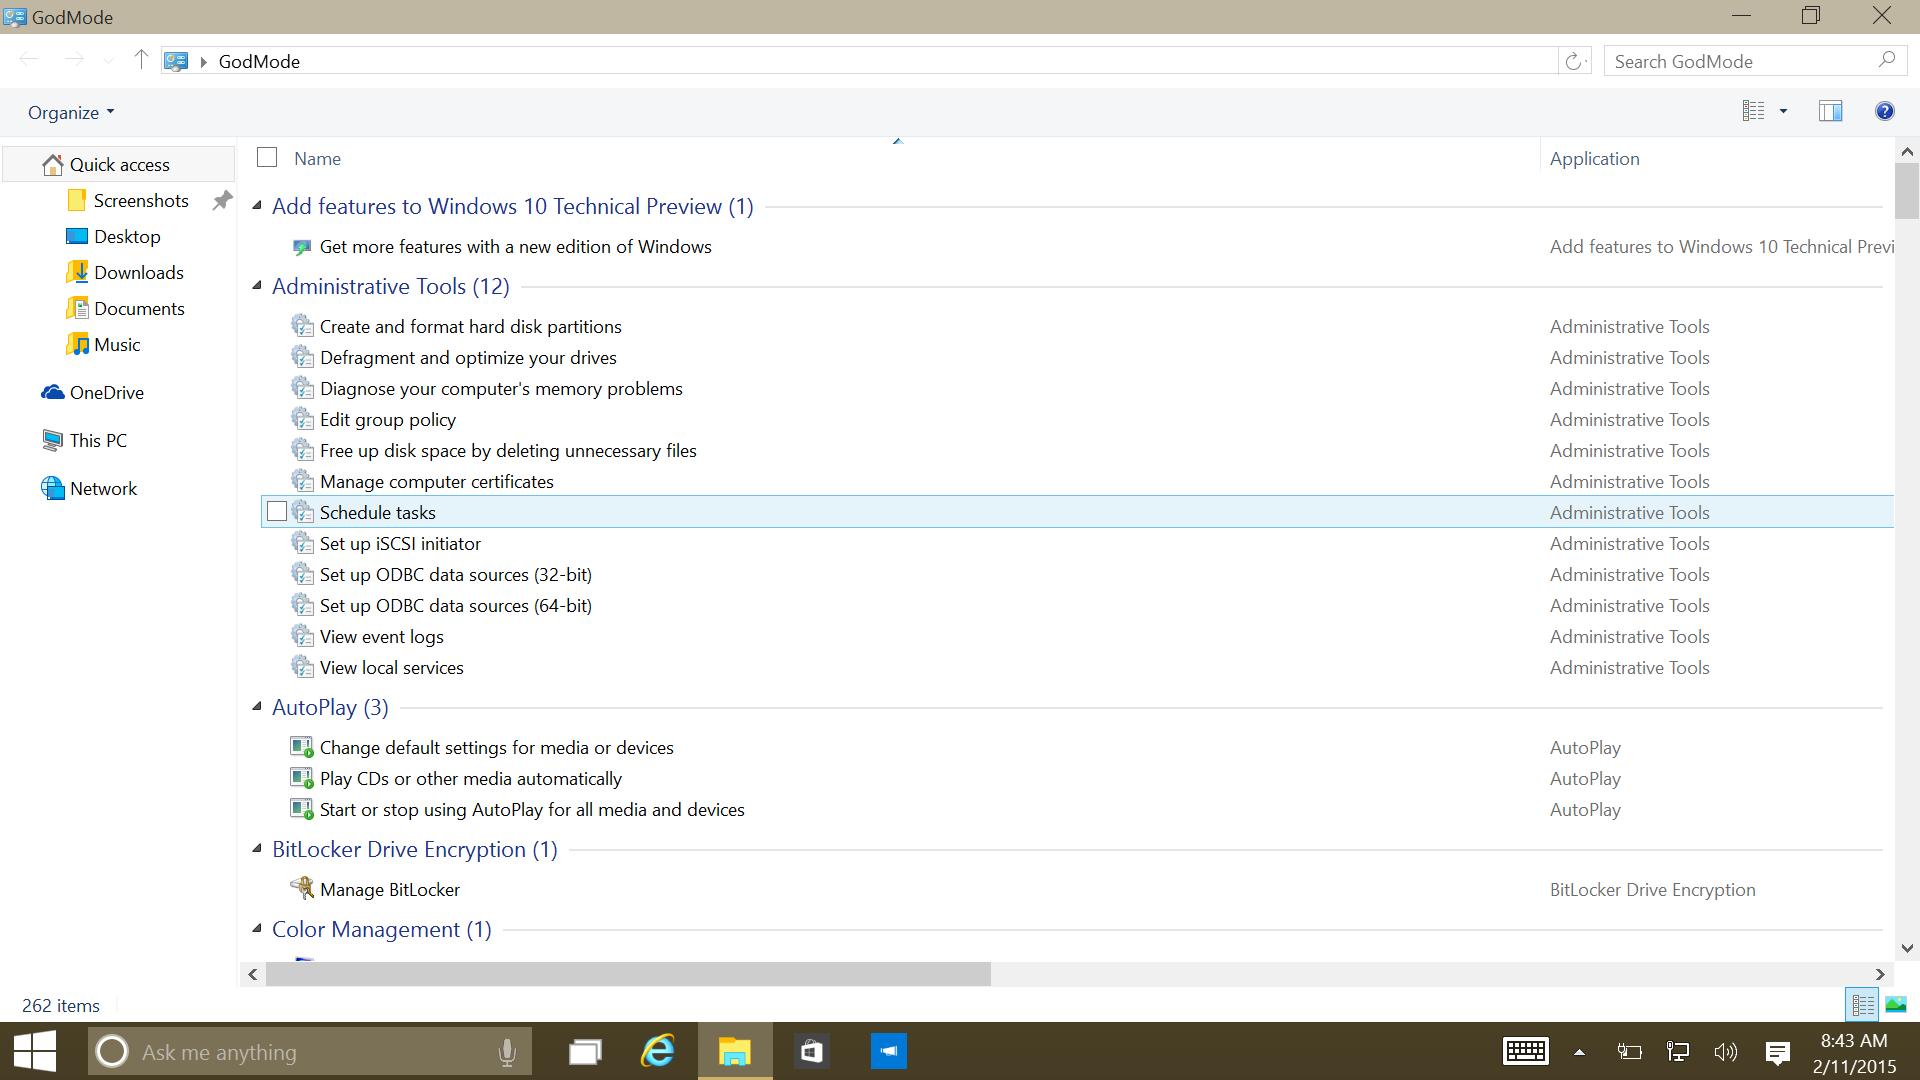 windows10-god-mode